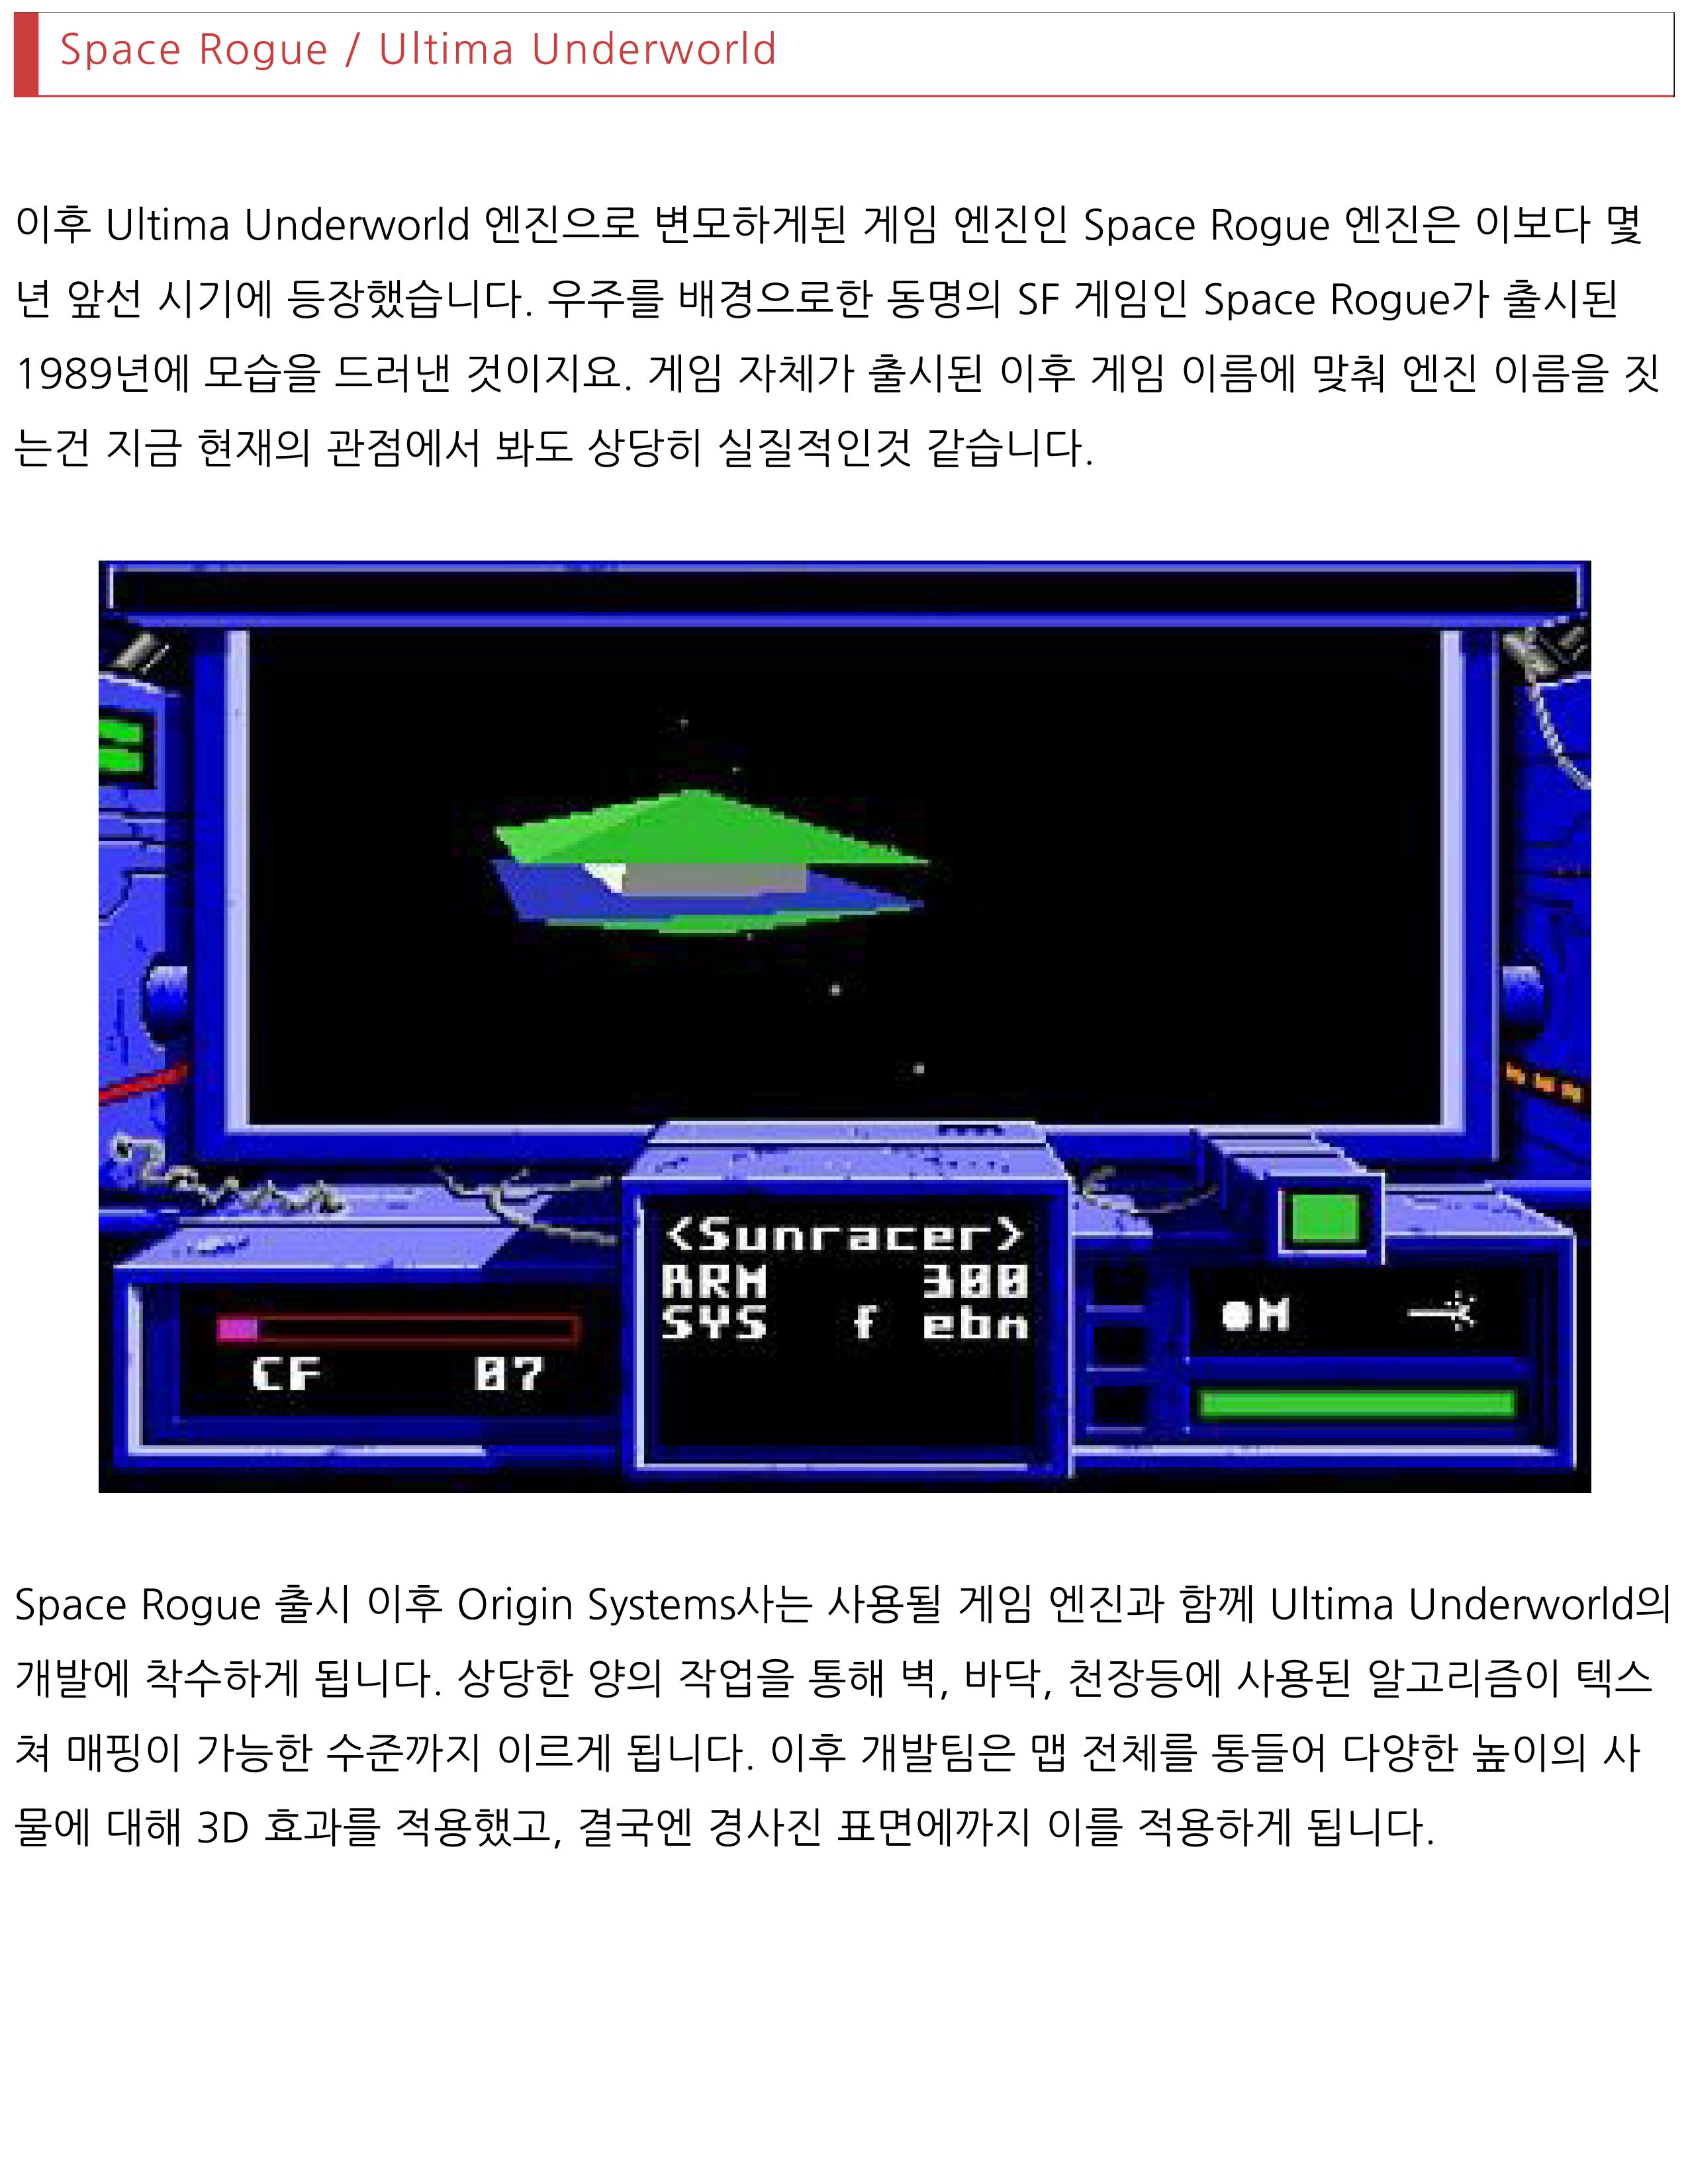 3D geim enjin, eoddeohge baljeo - jeonhyeonseog_09